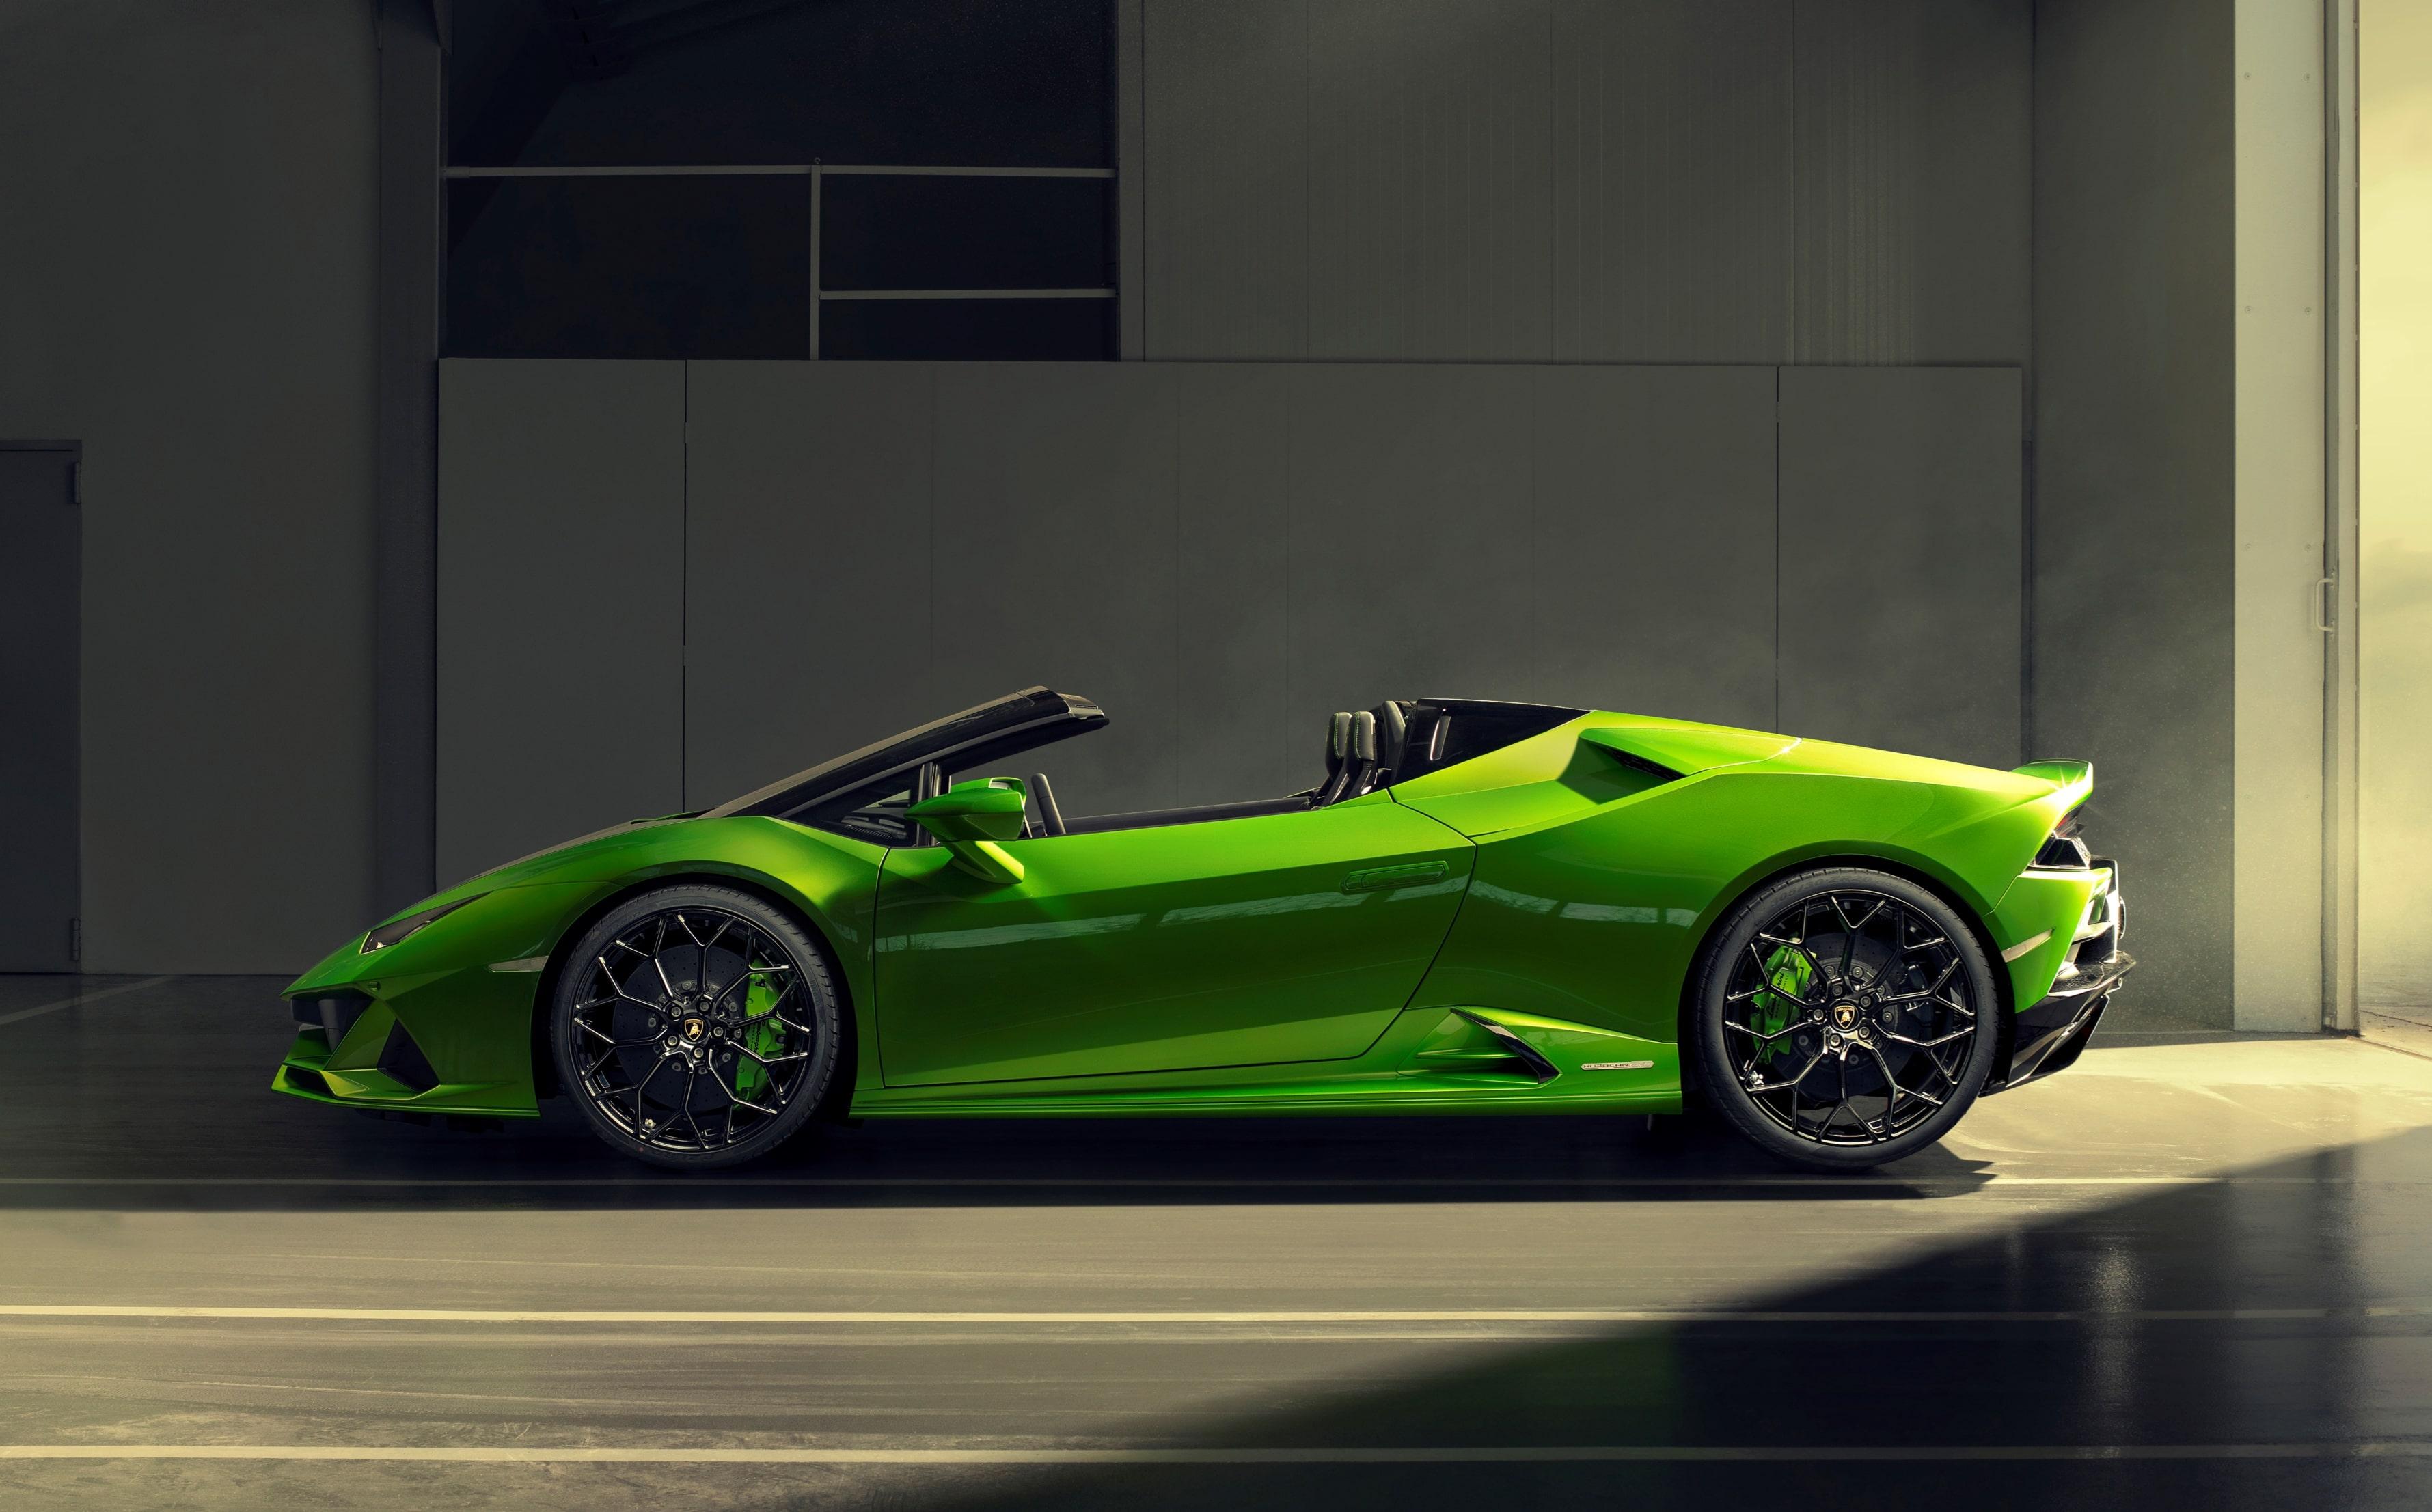 Lamborghini Huracan Evo Spyder O tradicional motor V10 5.2 naturalmente aspirado foi atualizado